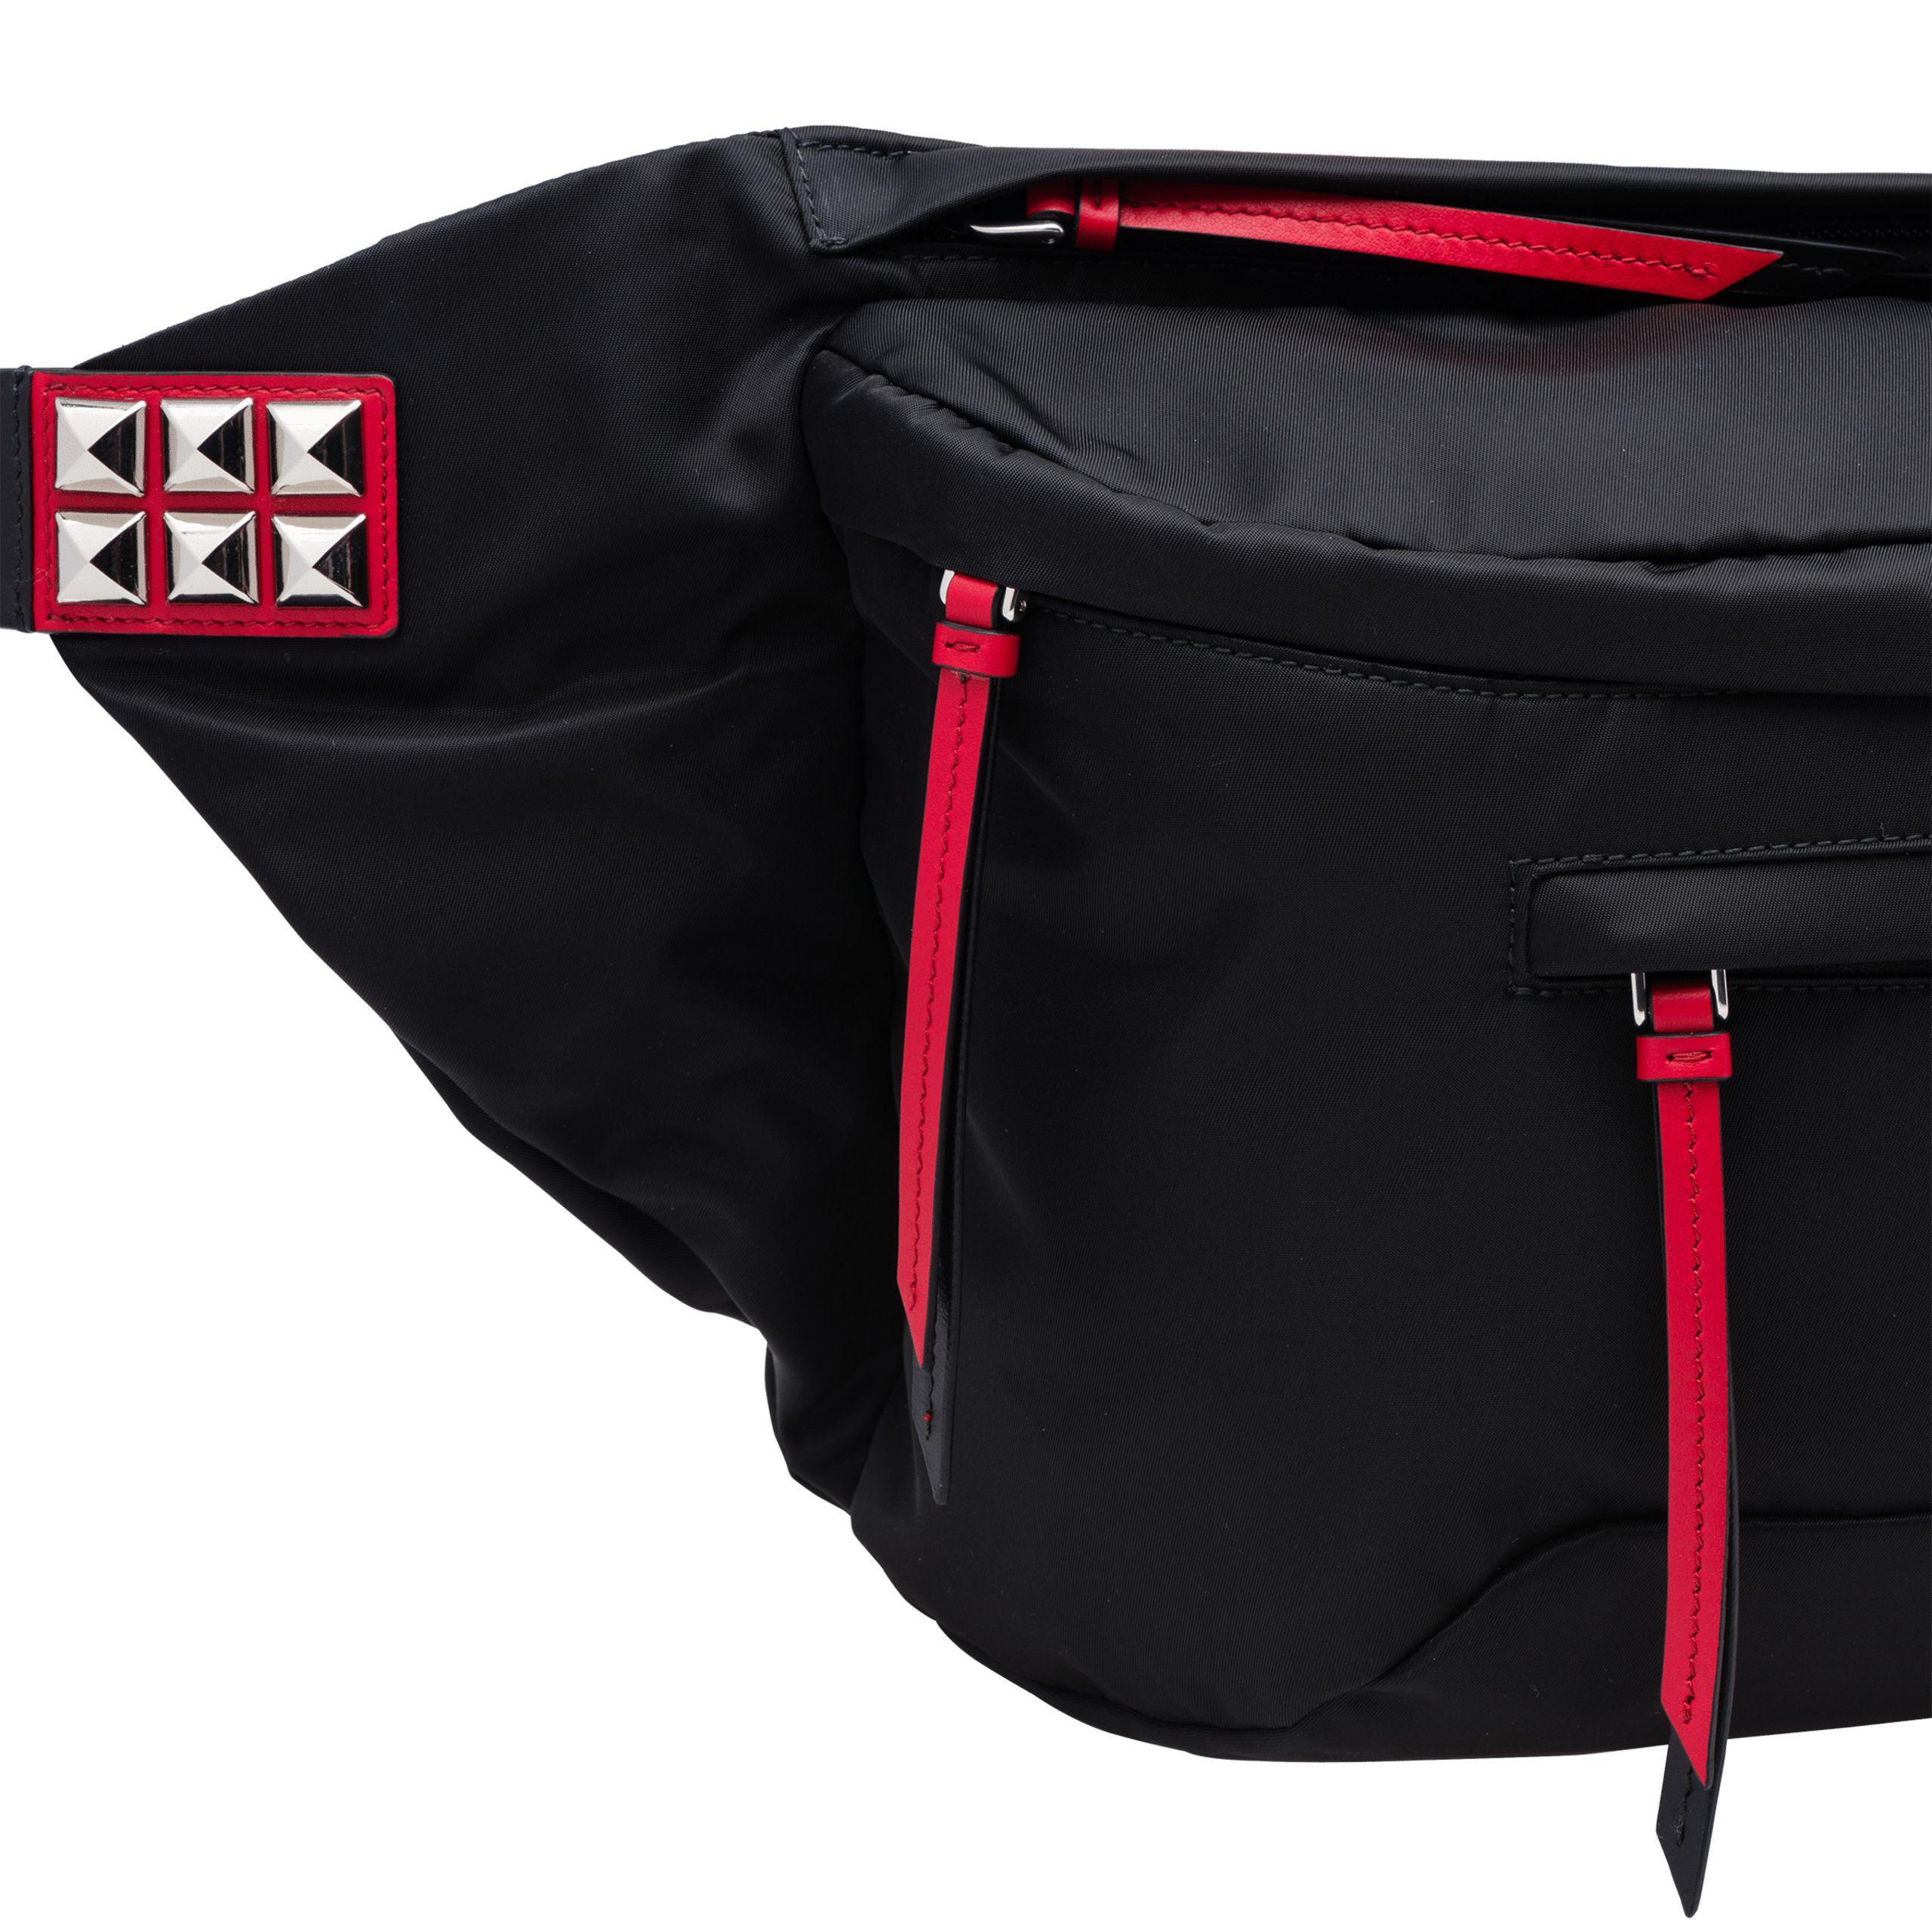 e35cef972dd5 Lyst - Prada Black Nylon Belt Bag in Black